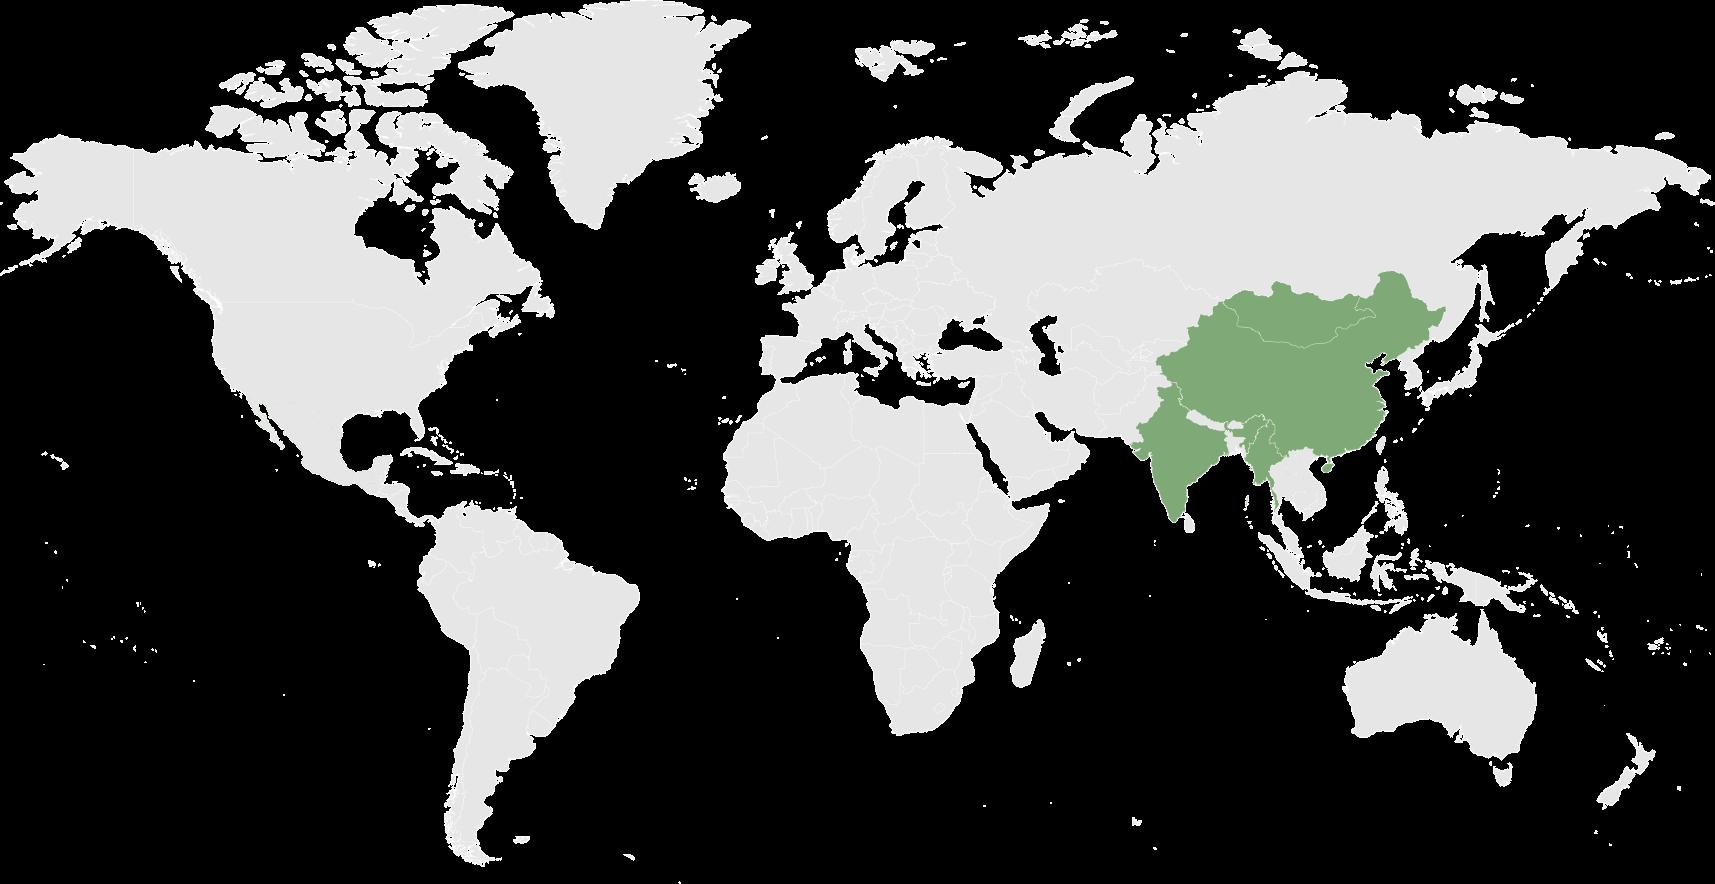 FY 2021